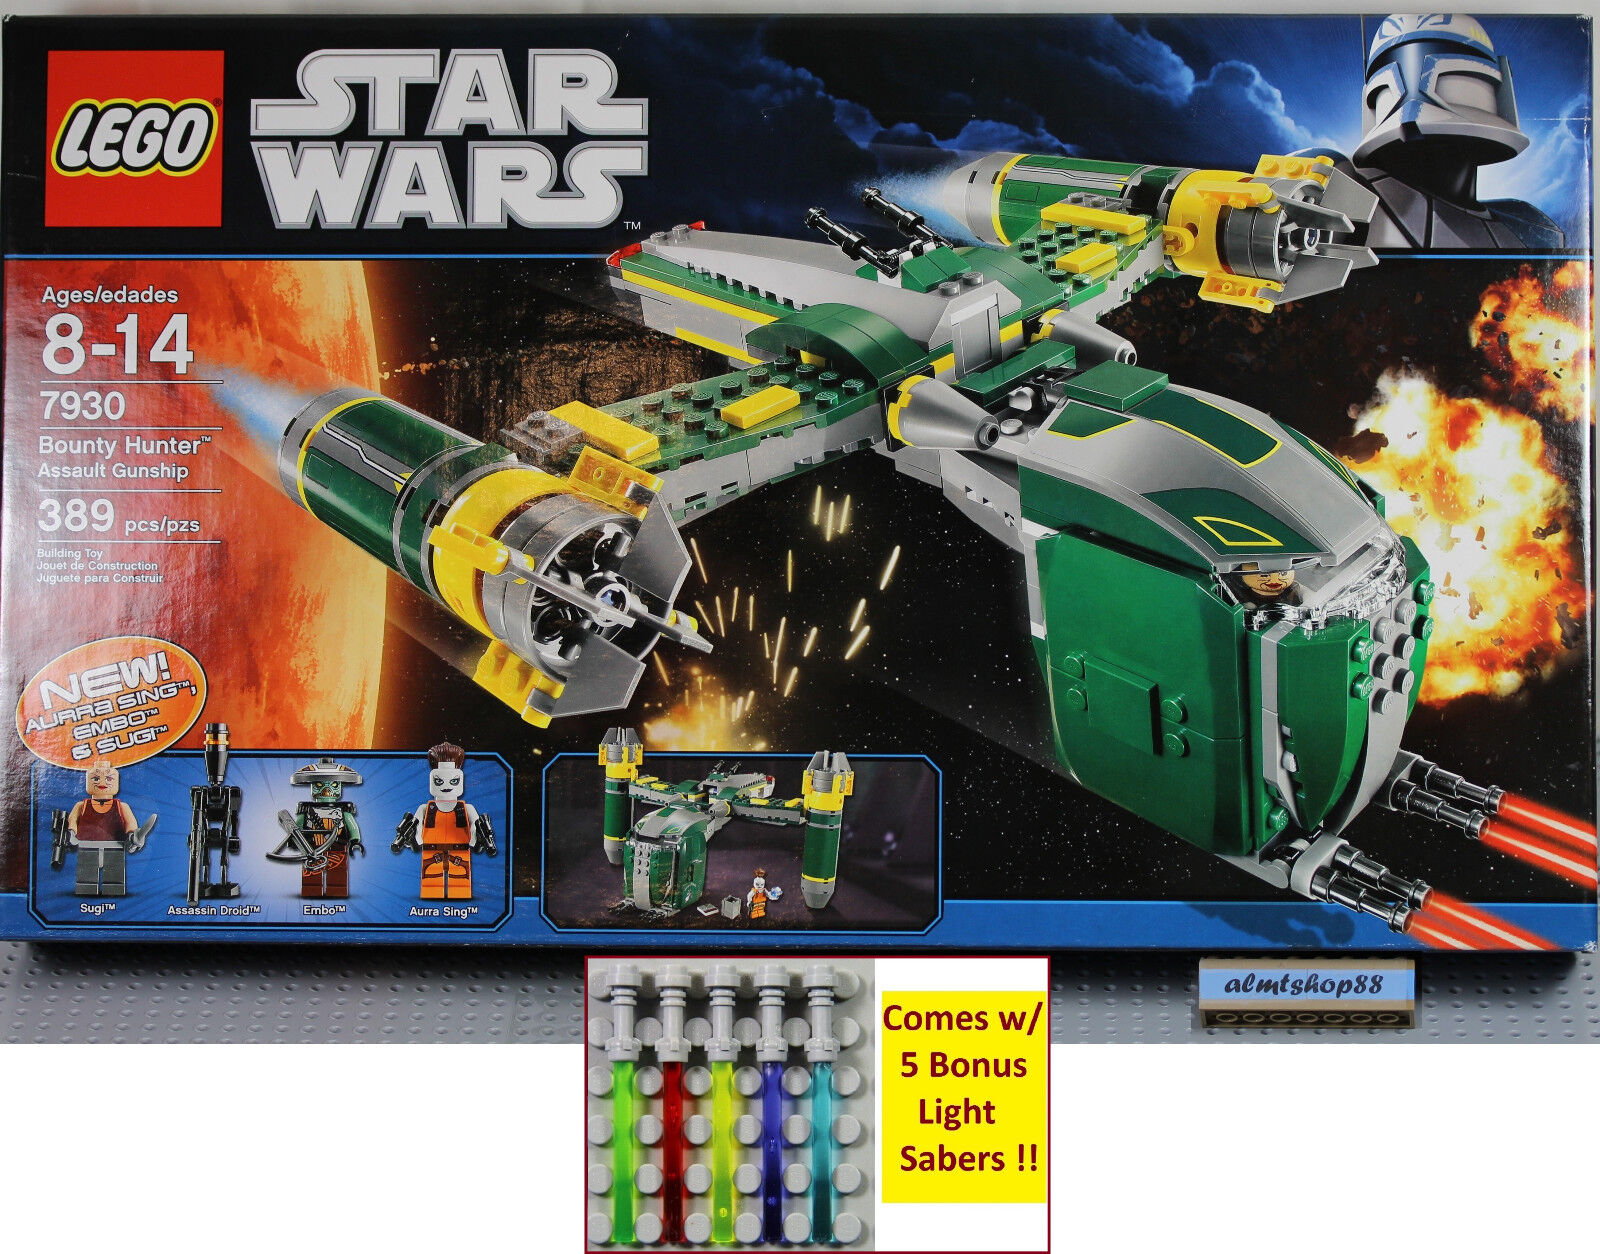 LEGO Star Wars - 7930 Bounty Hunter Assault Gunship NISB Aurra Sing Embo Sugi